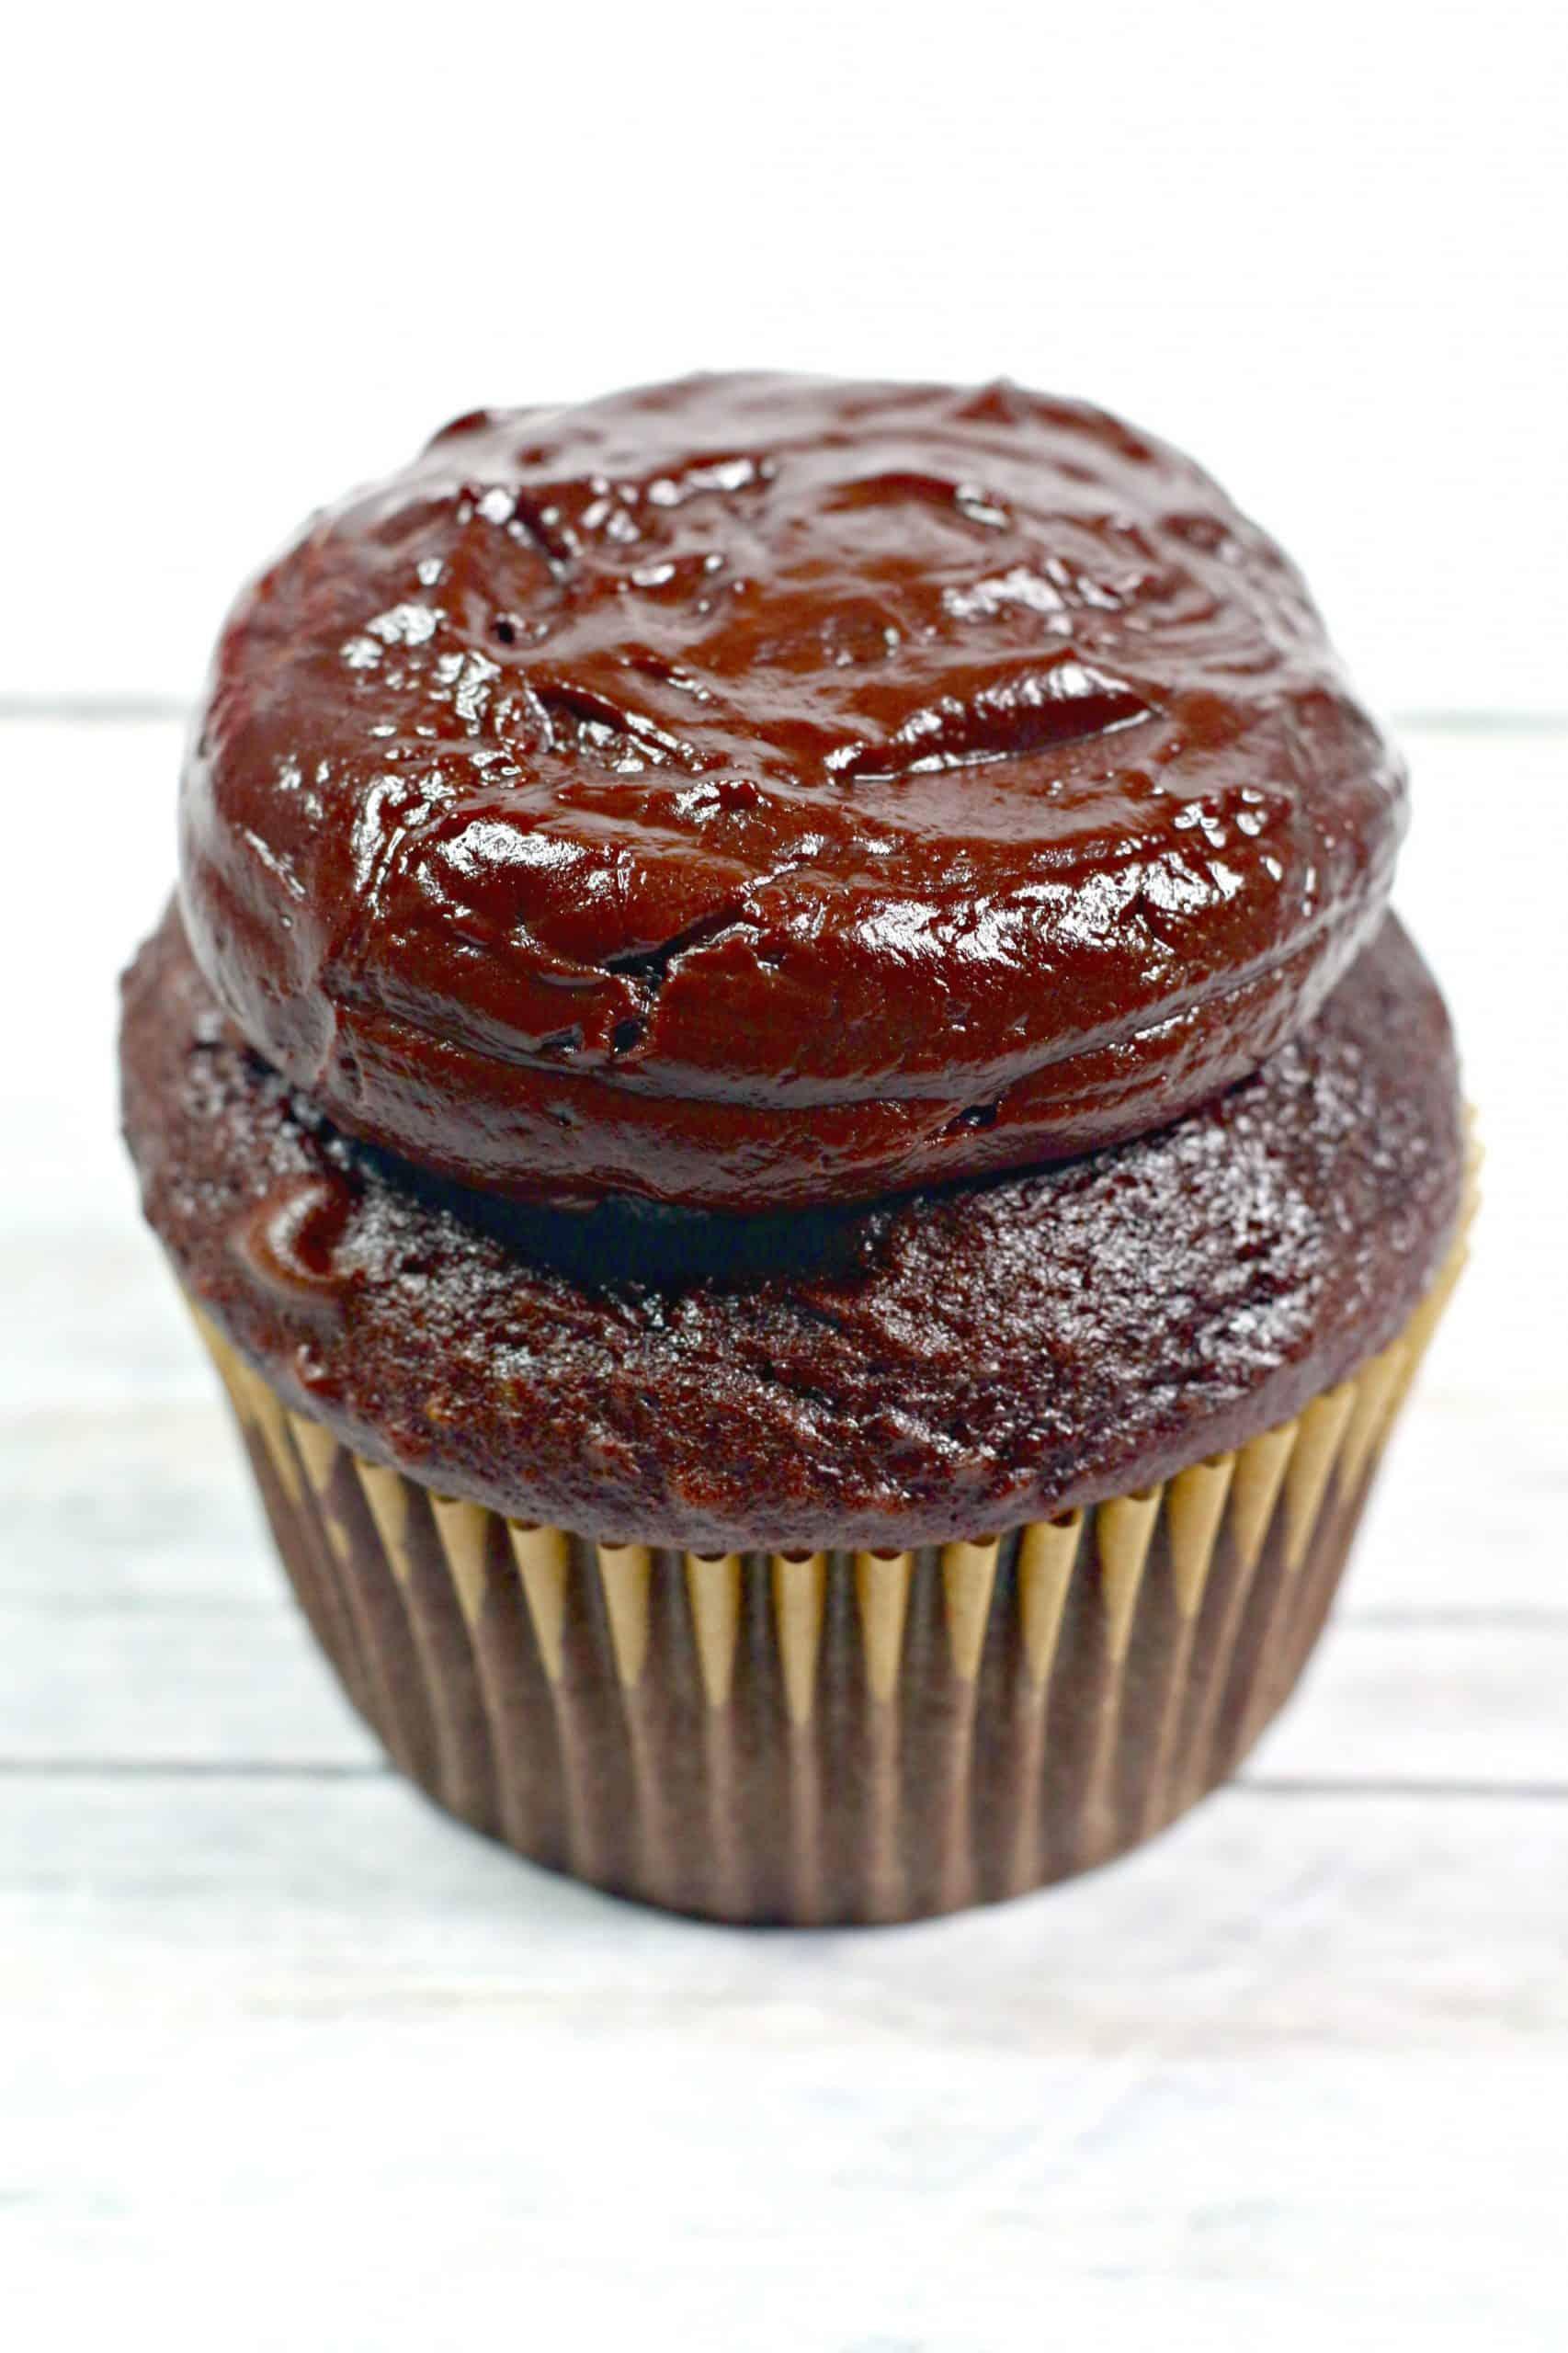 ganache on cupcake